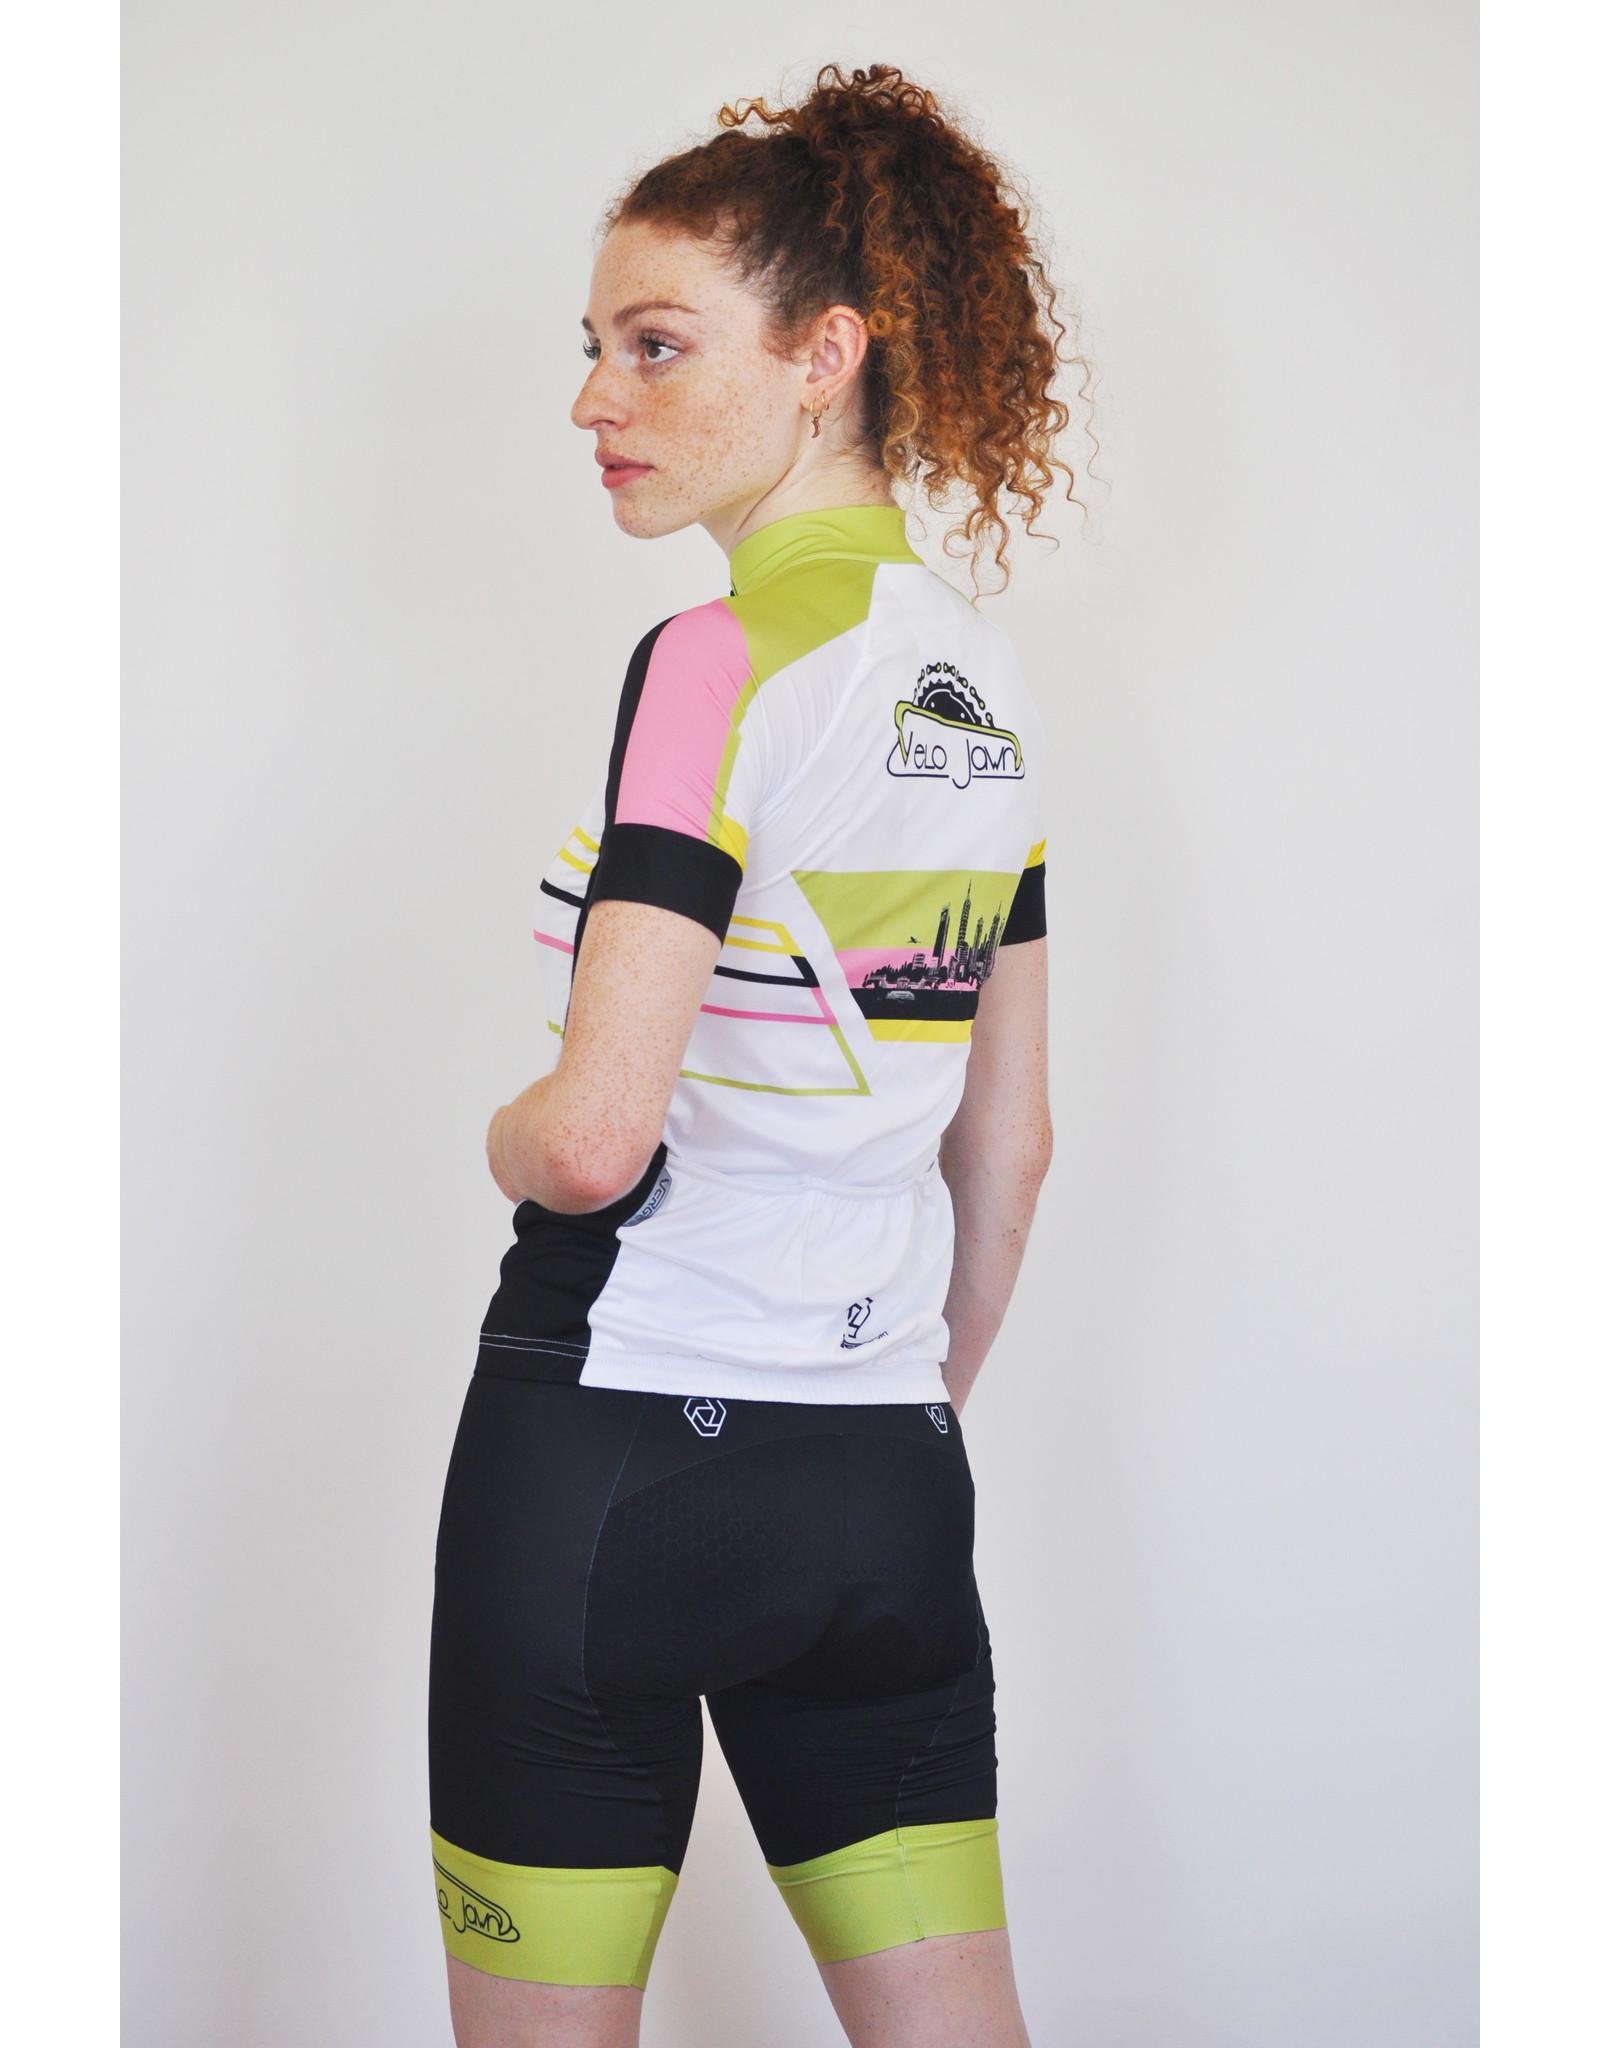 Verge VeloJawn White Strike Short Sleeve Jersey Women's